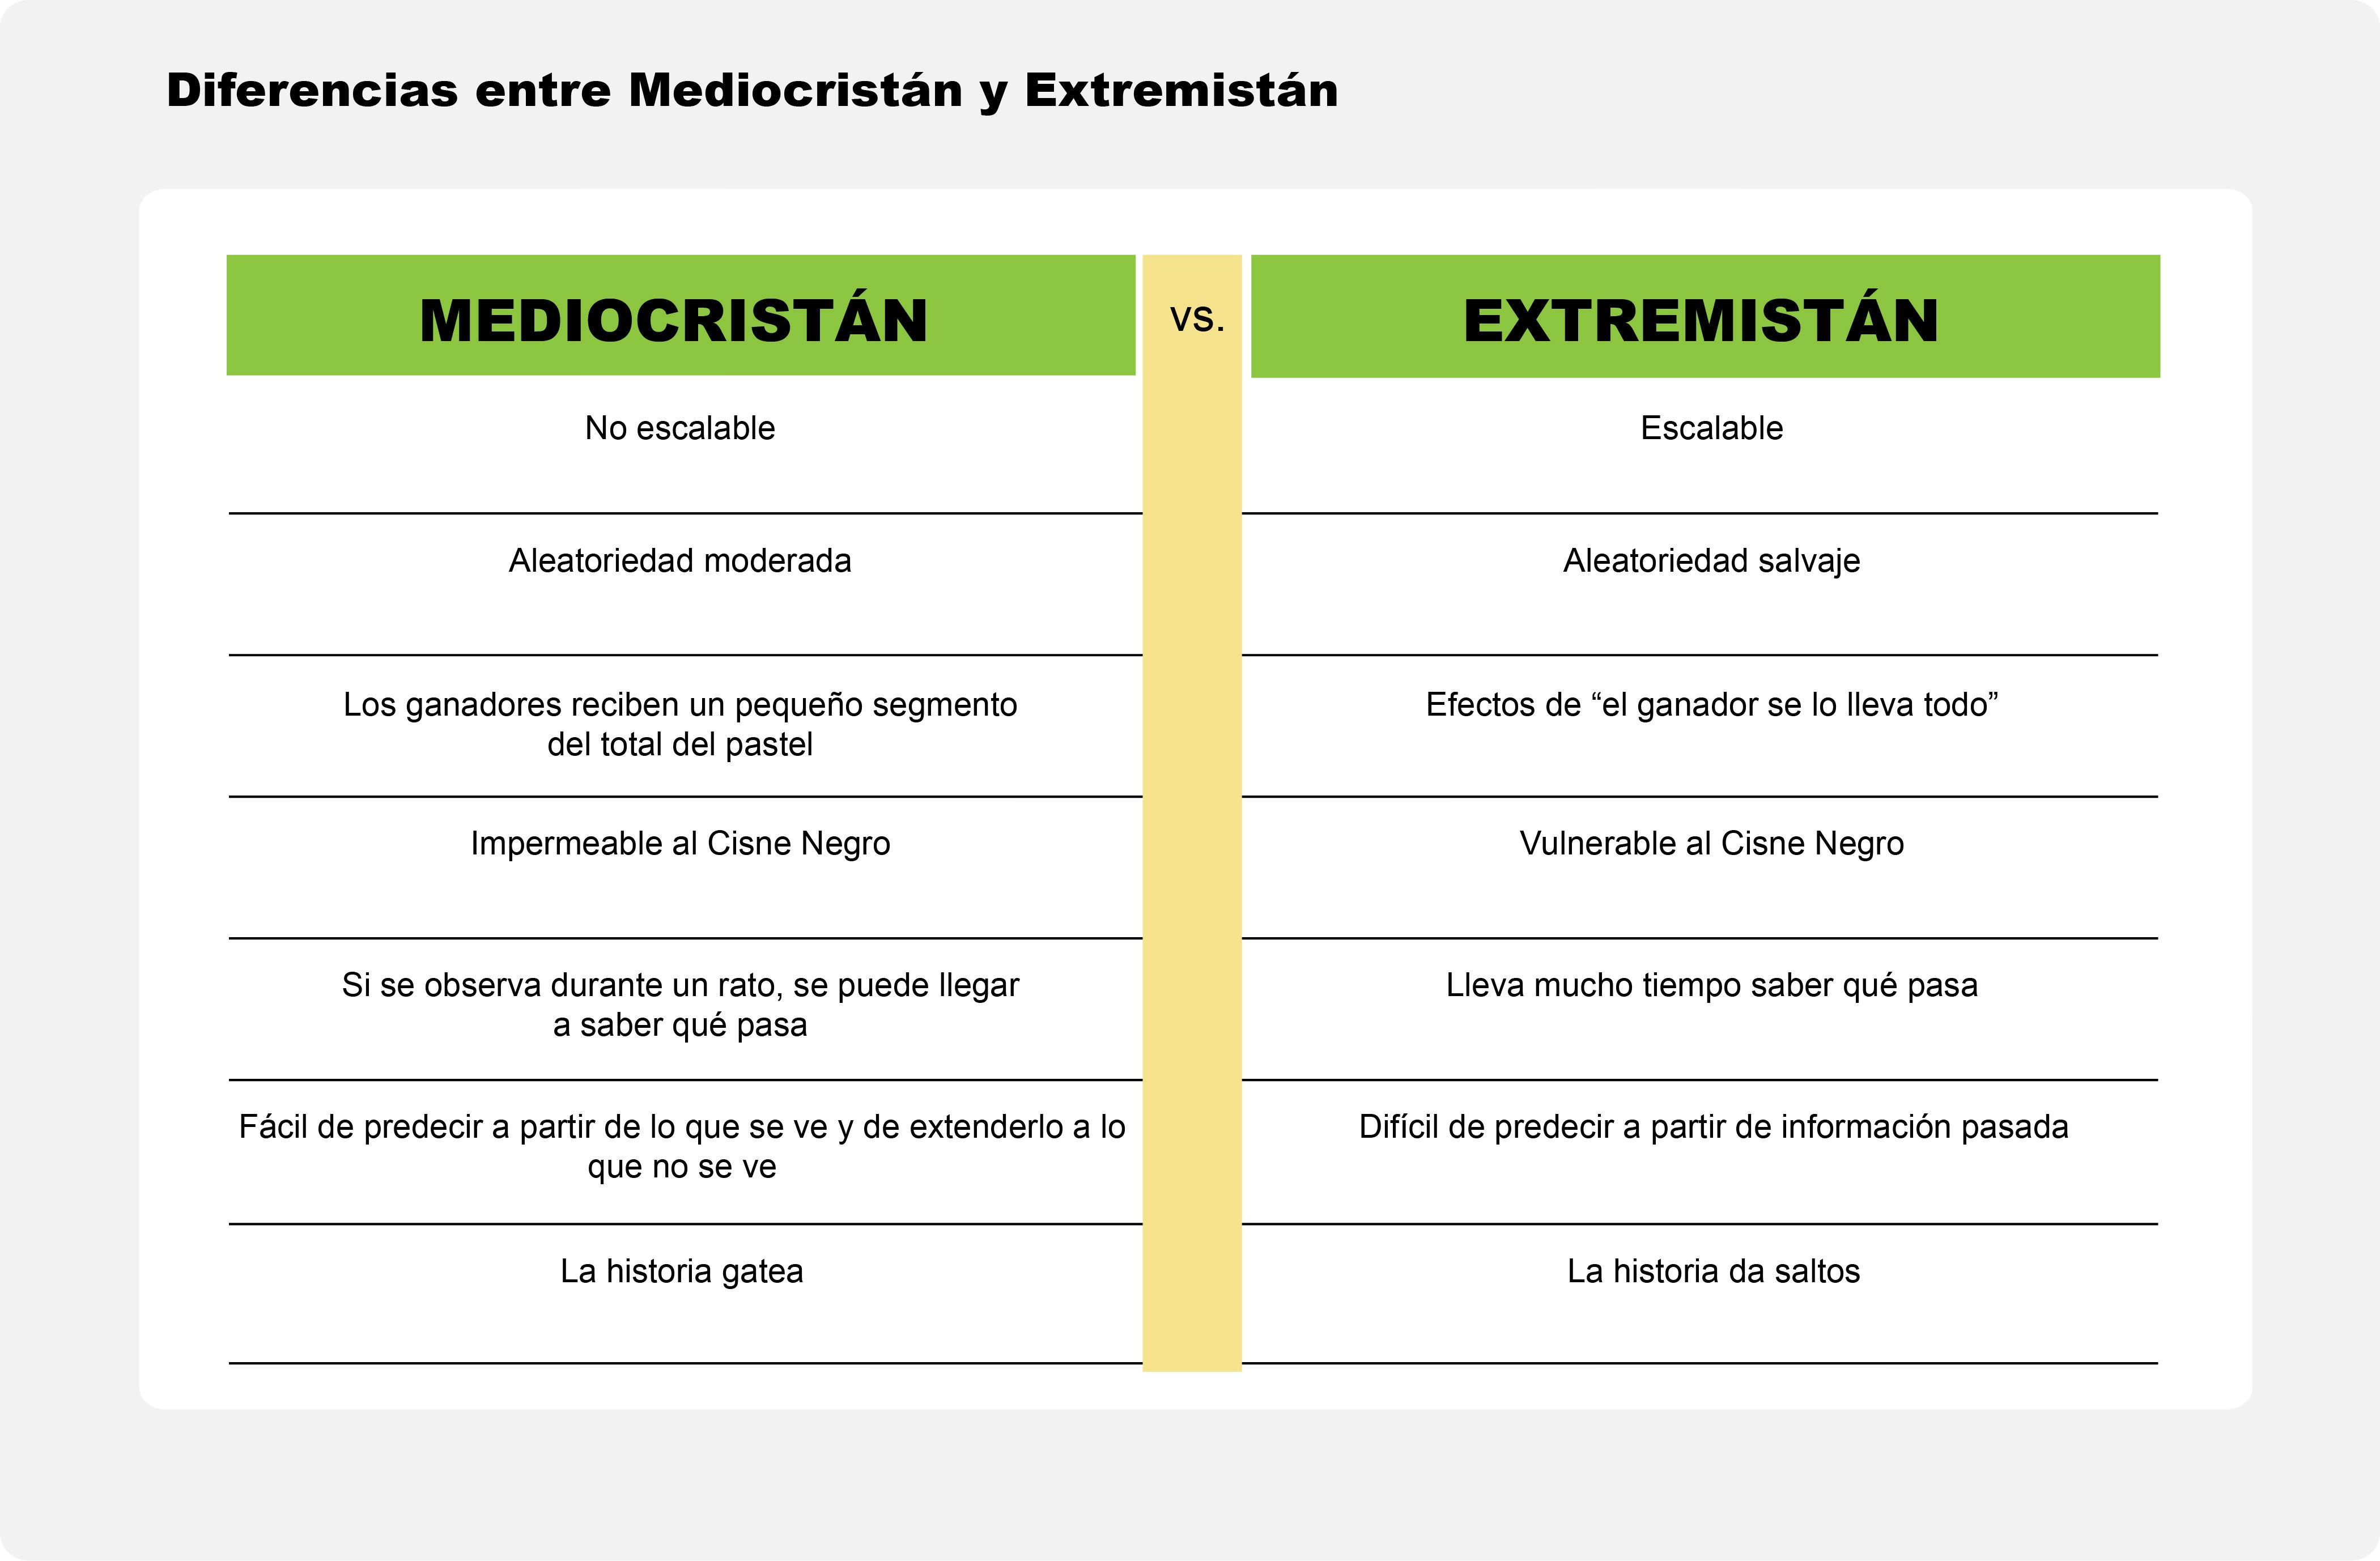 De Mediocristán a Extremistán